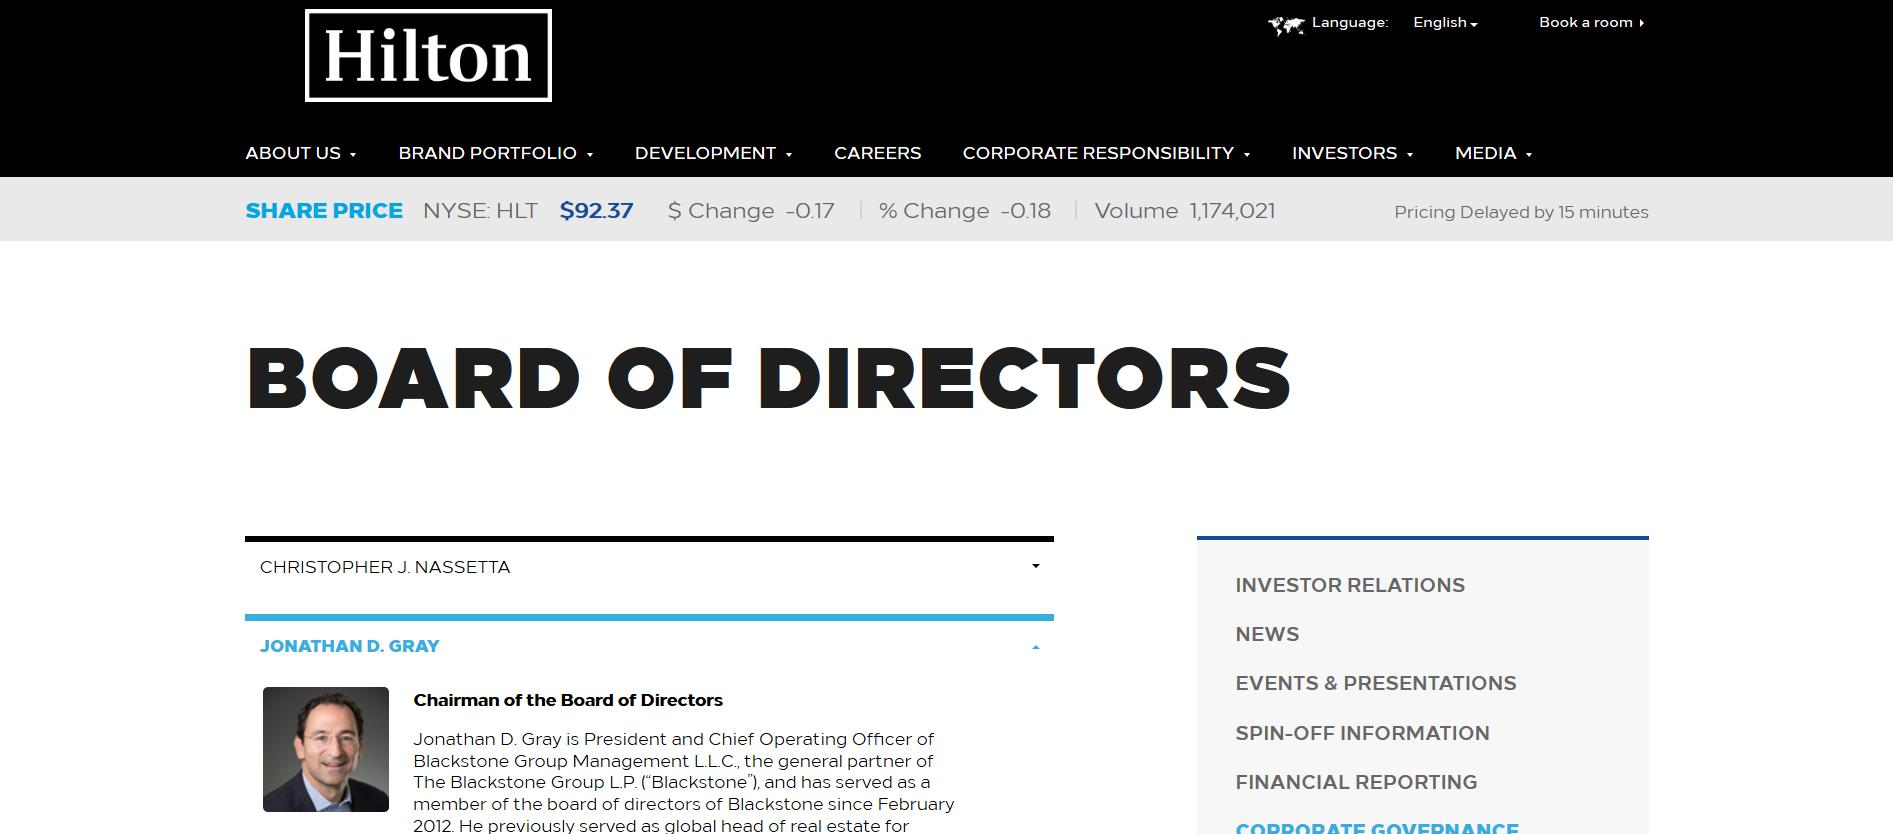 Hilton Bd of Directors Blackstone Group Jonathan Gray Chrm CFO.png